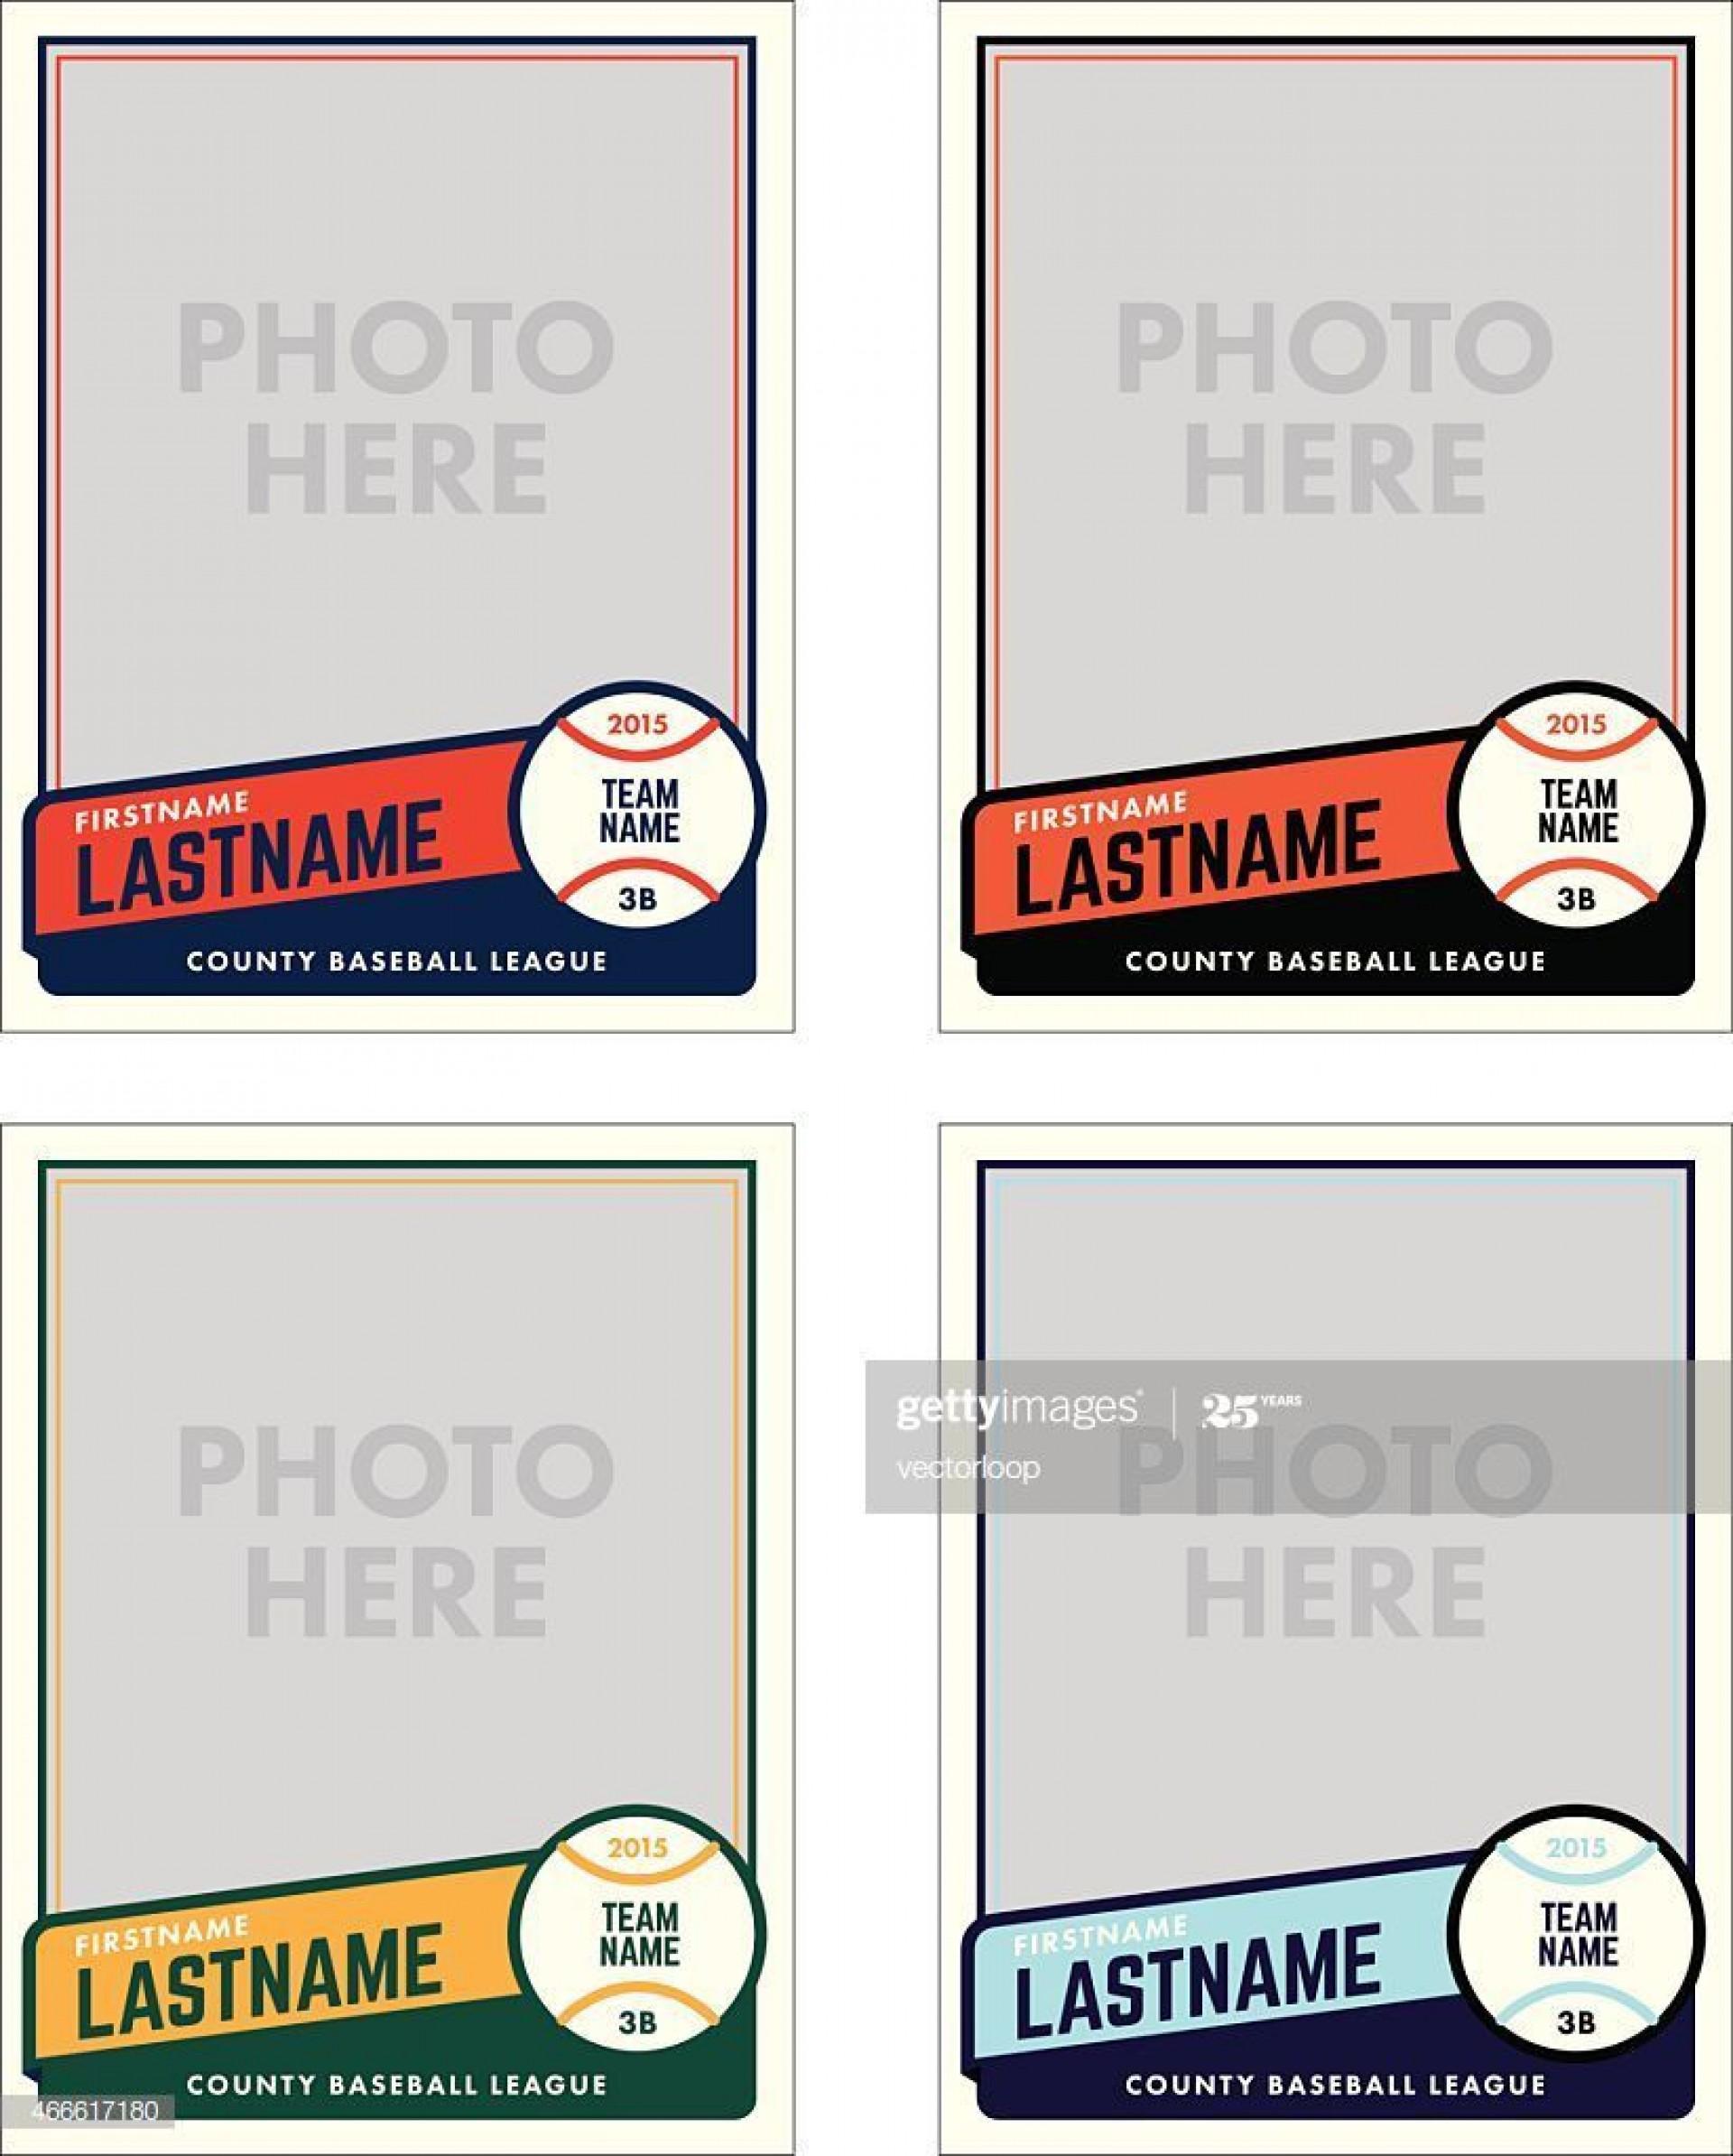 003 Wondrou Baseball Card Template Photoshop Highest Quality  Topp Free1920